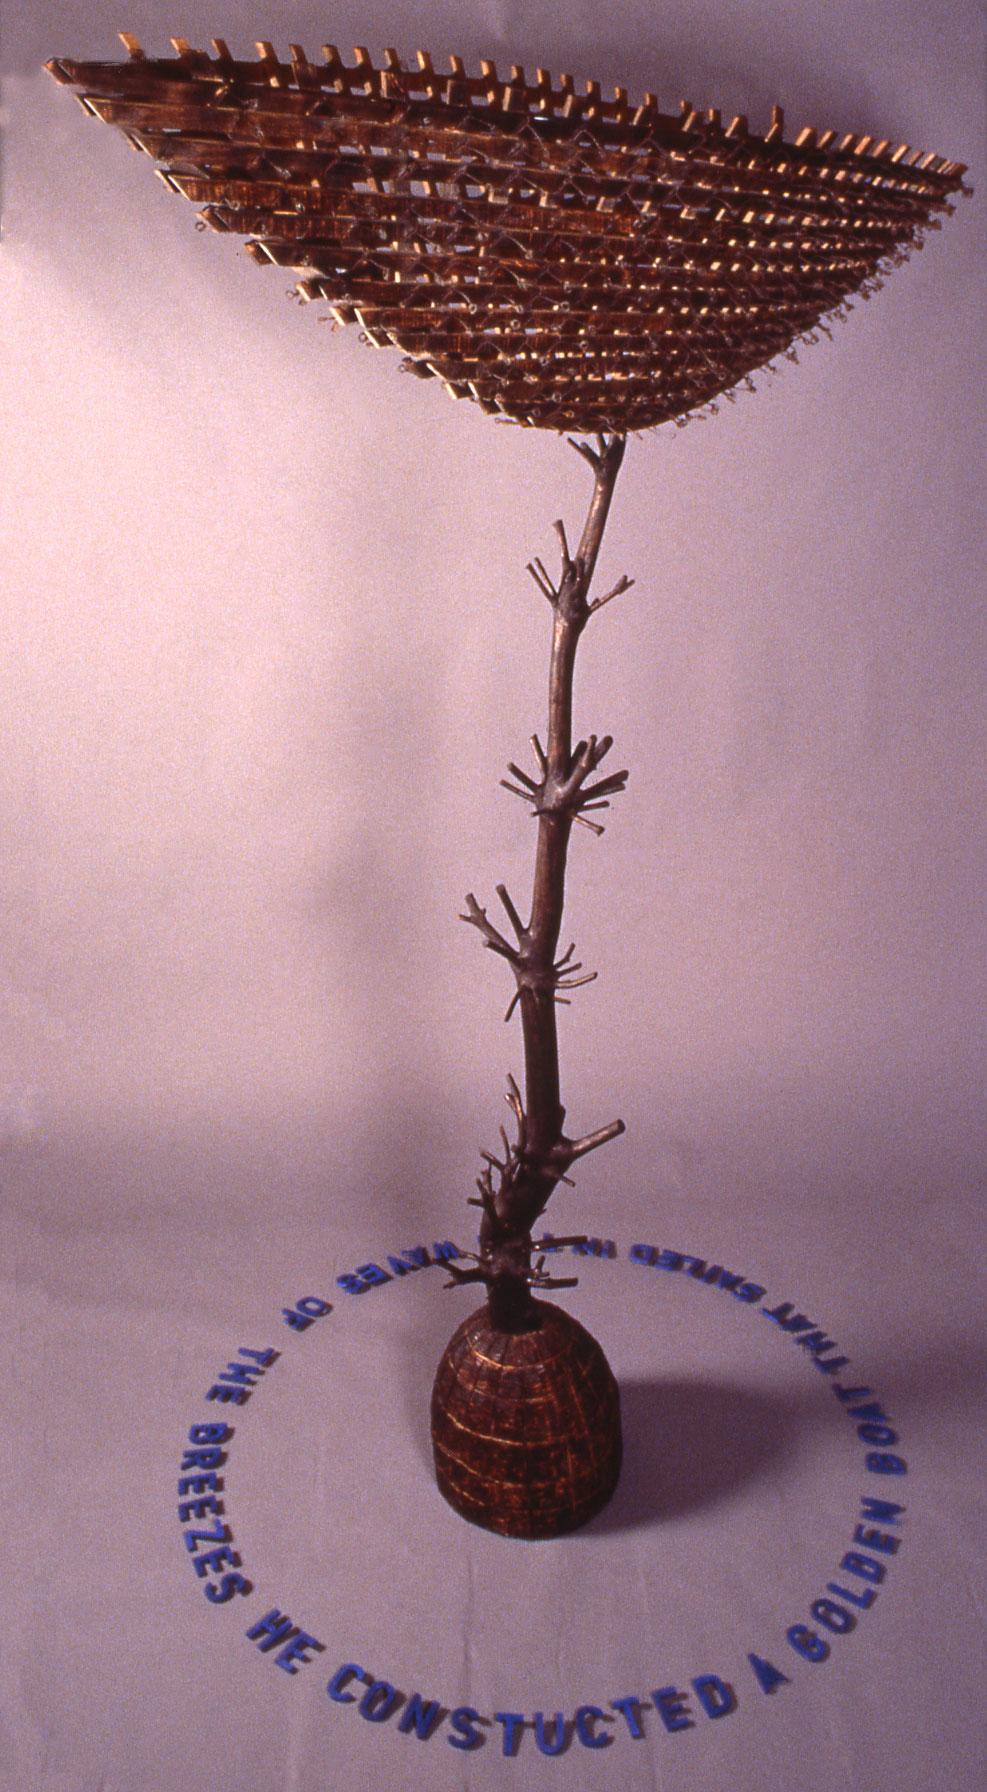 wood-sculpture-tom-gormally-ritual-monument-II.jpg